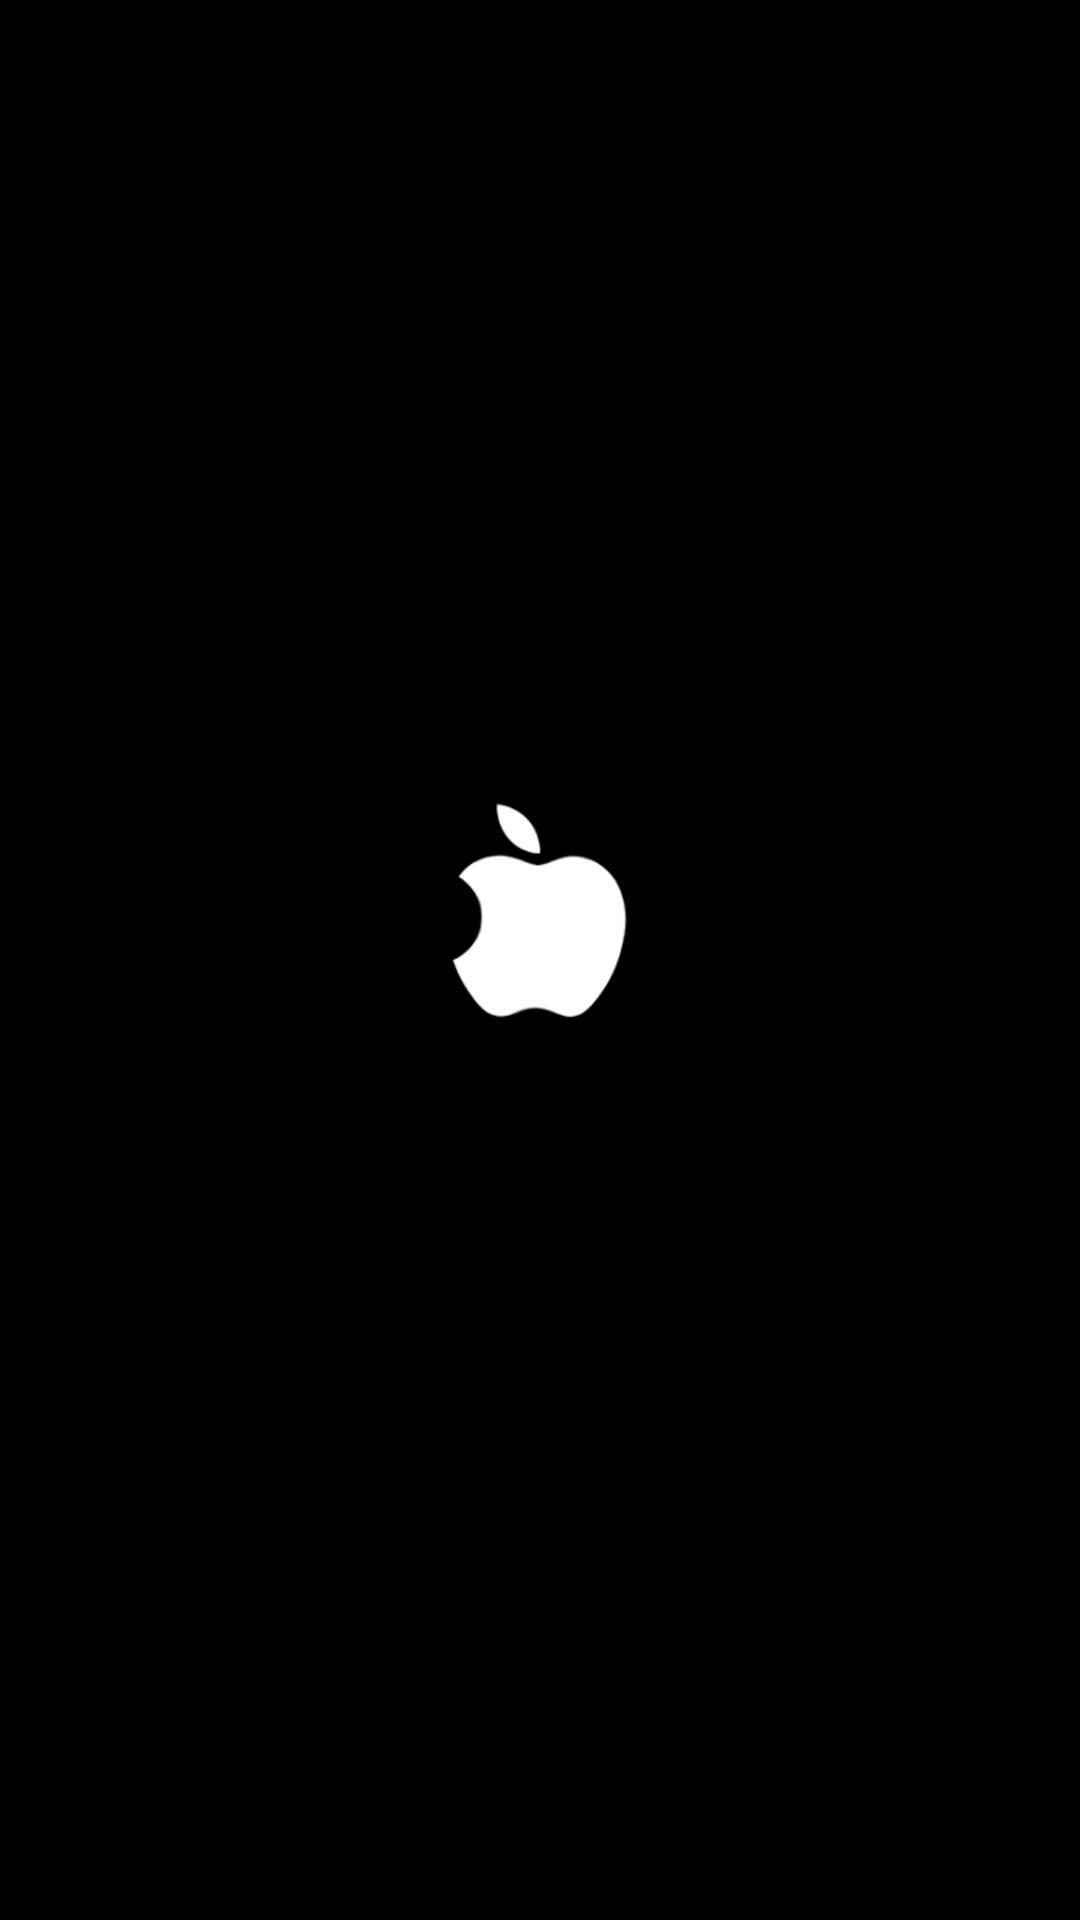 Wallpaper Black Apple For Iphone 7 Apple Wallpaper Iphone